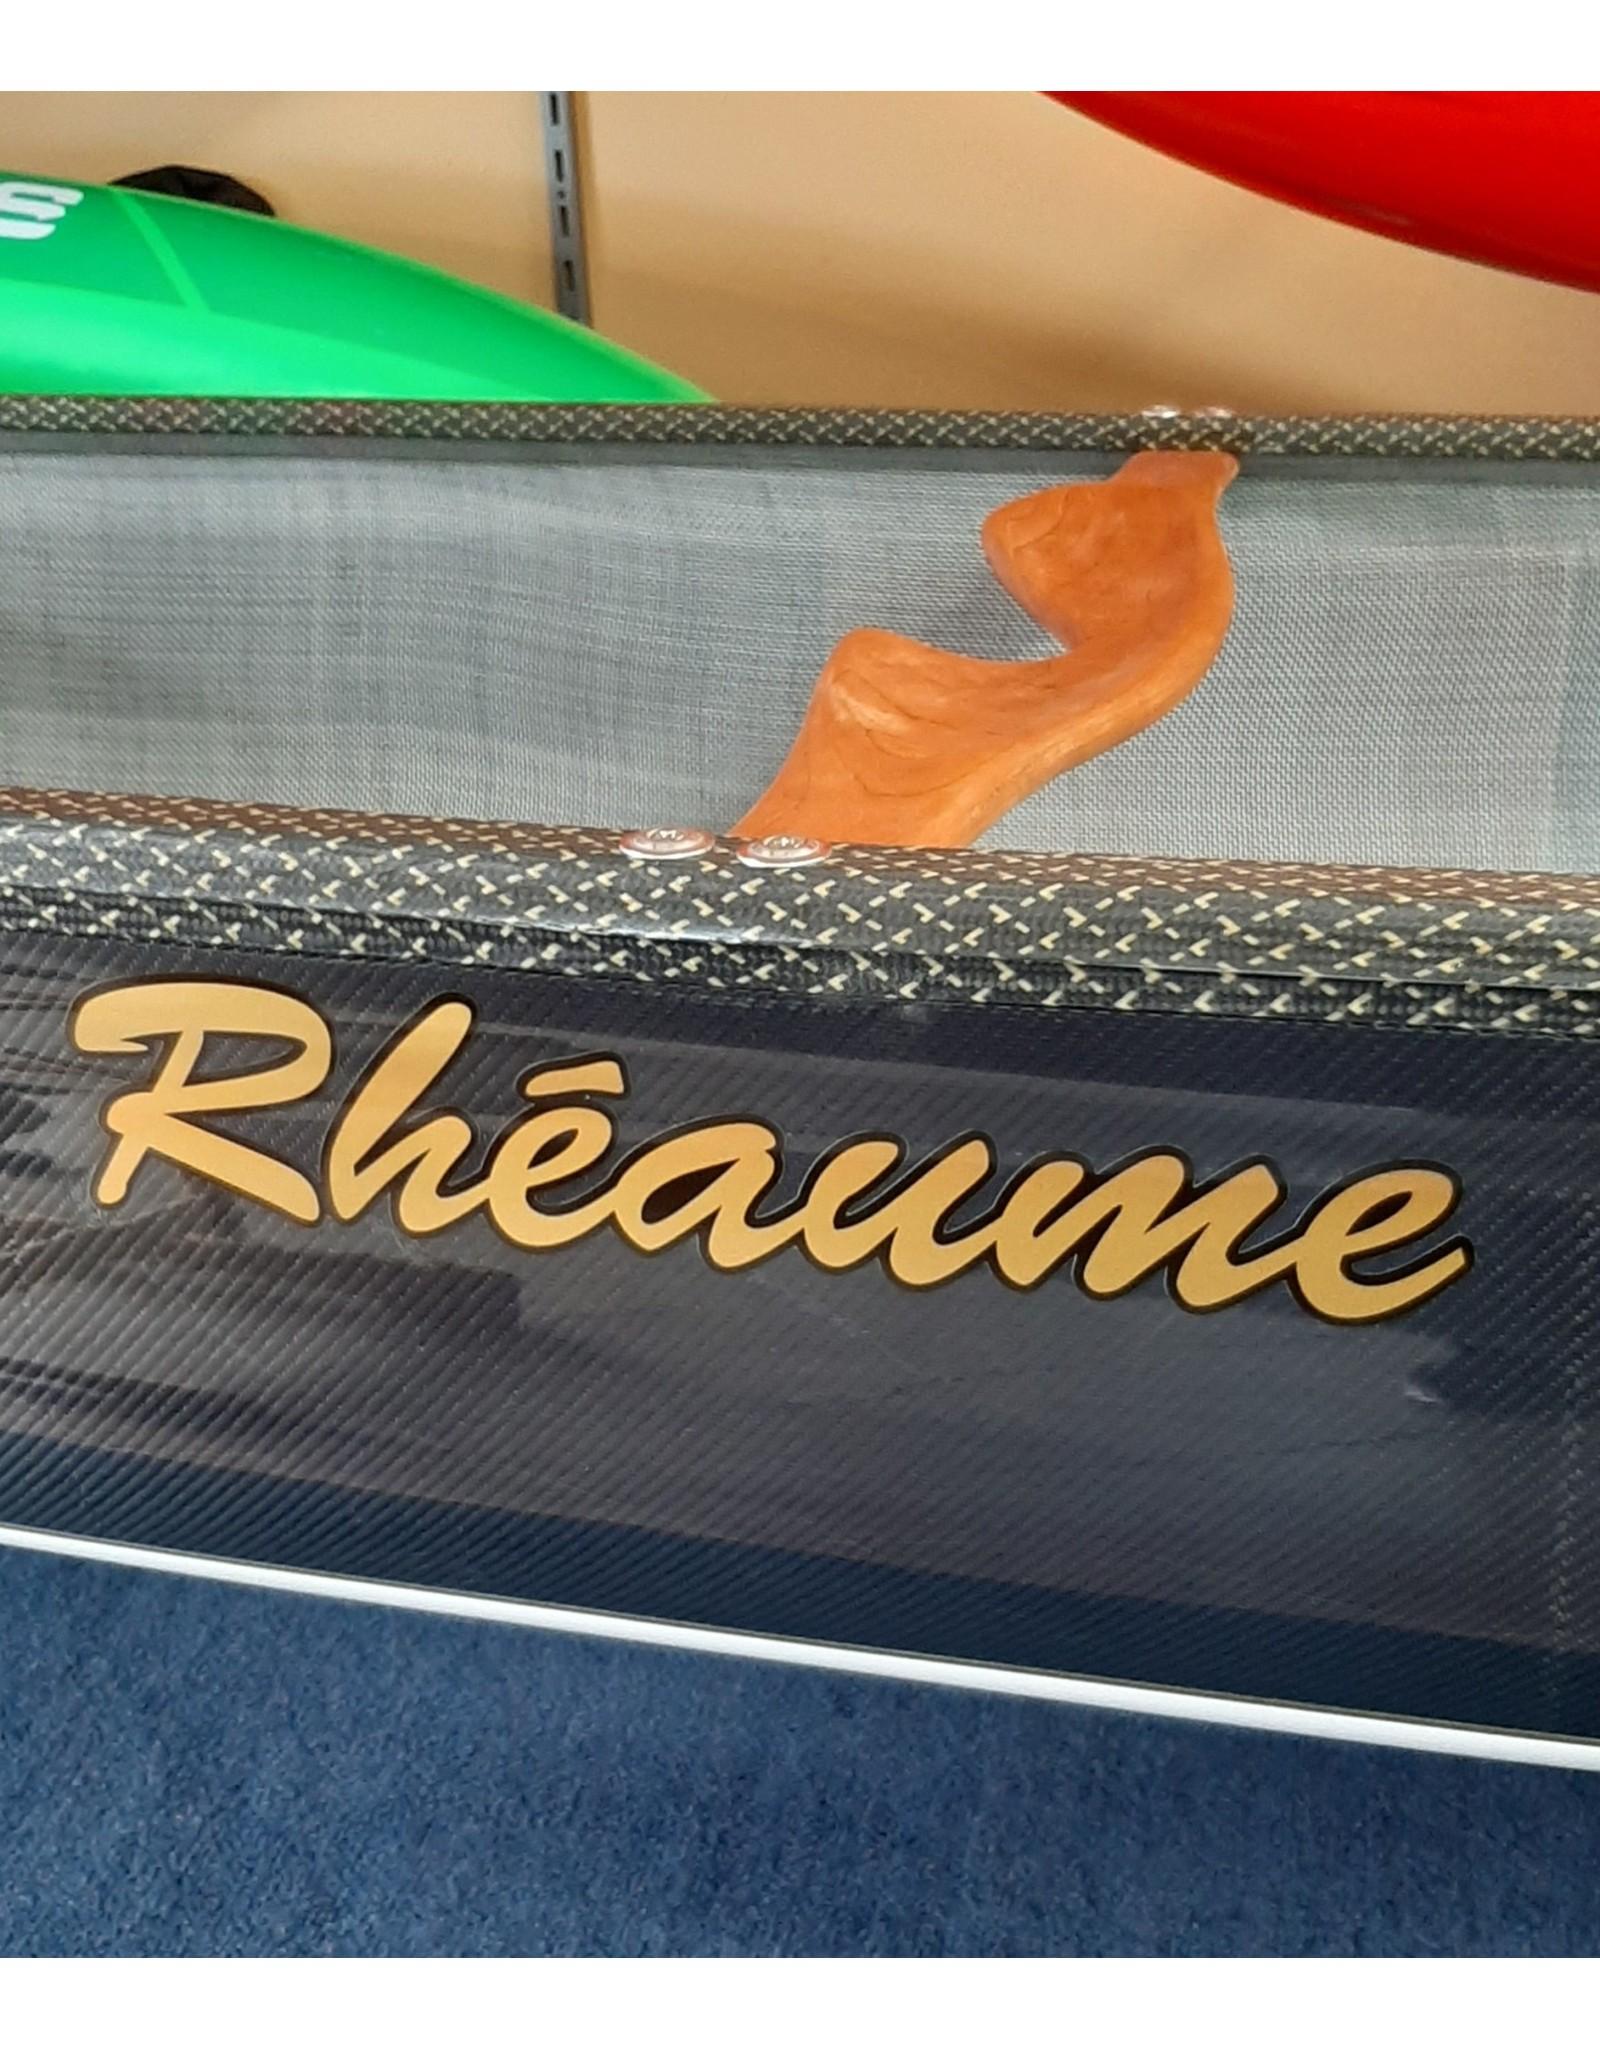 Canots Rhéaume Rhéaume Explorer Canoe 16' (Innegra Carbon / Basalt) integrated gunwales